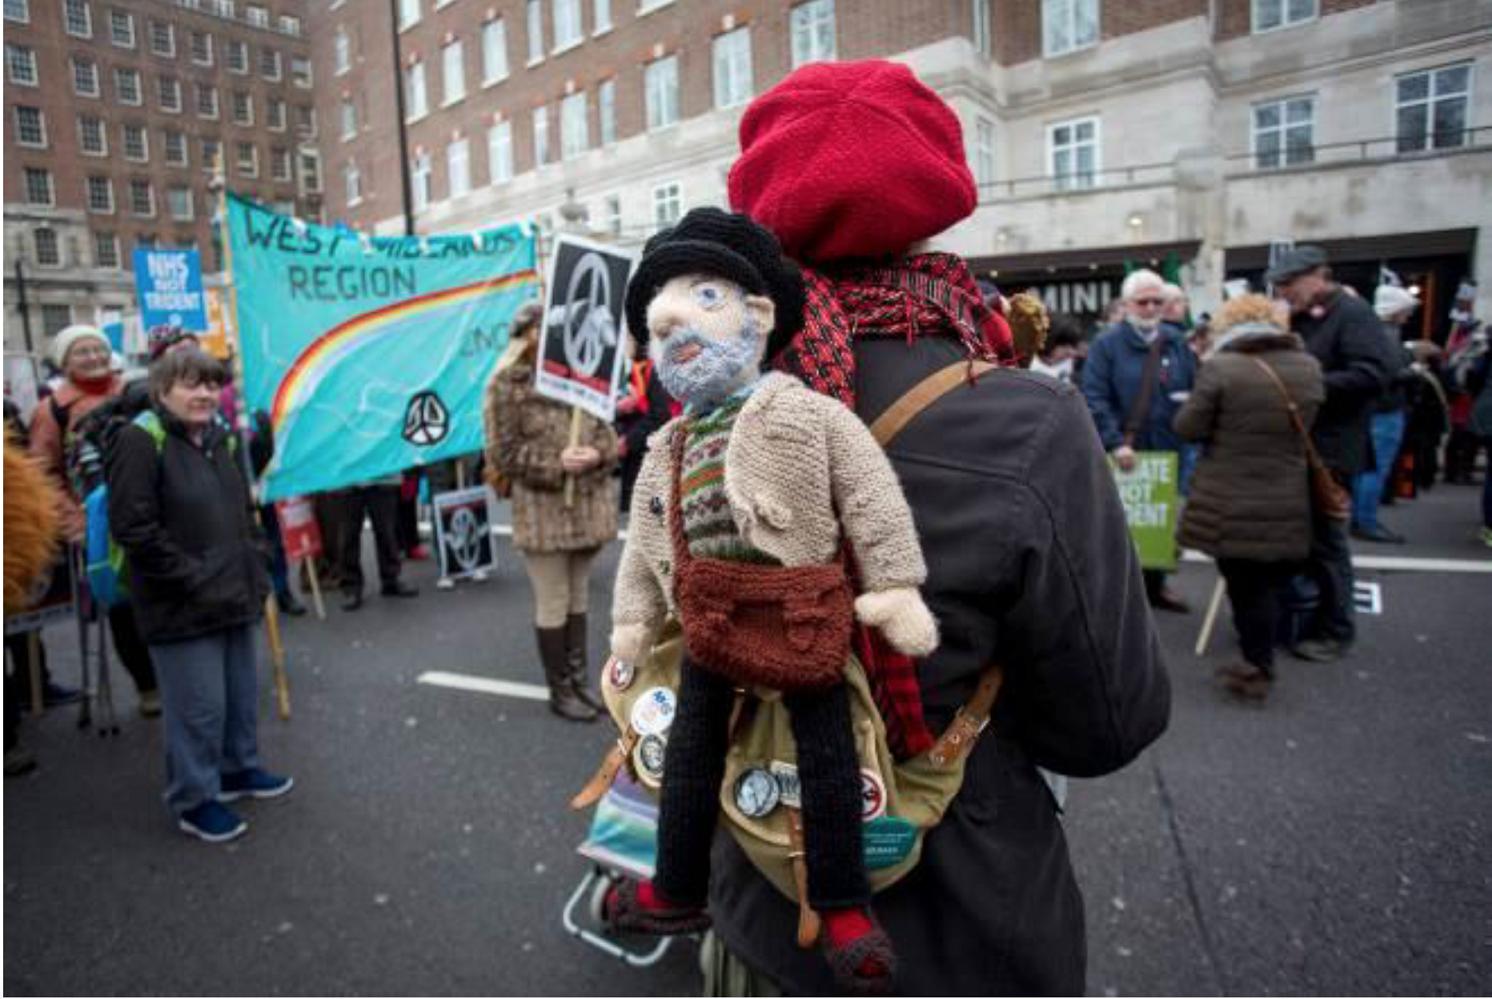 Protesto antinuclear em Londres, em 2016. Acervo Imperial War Museum